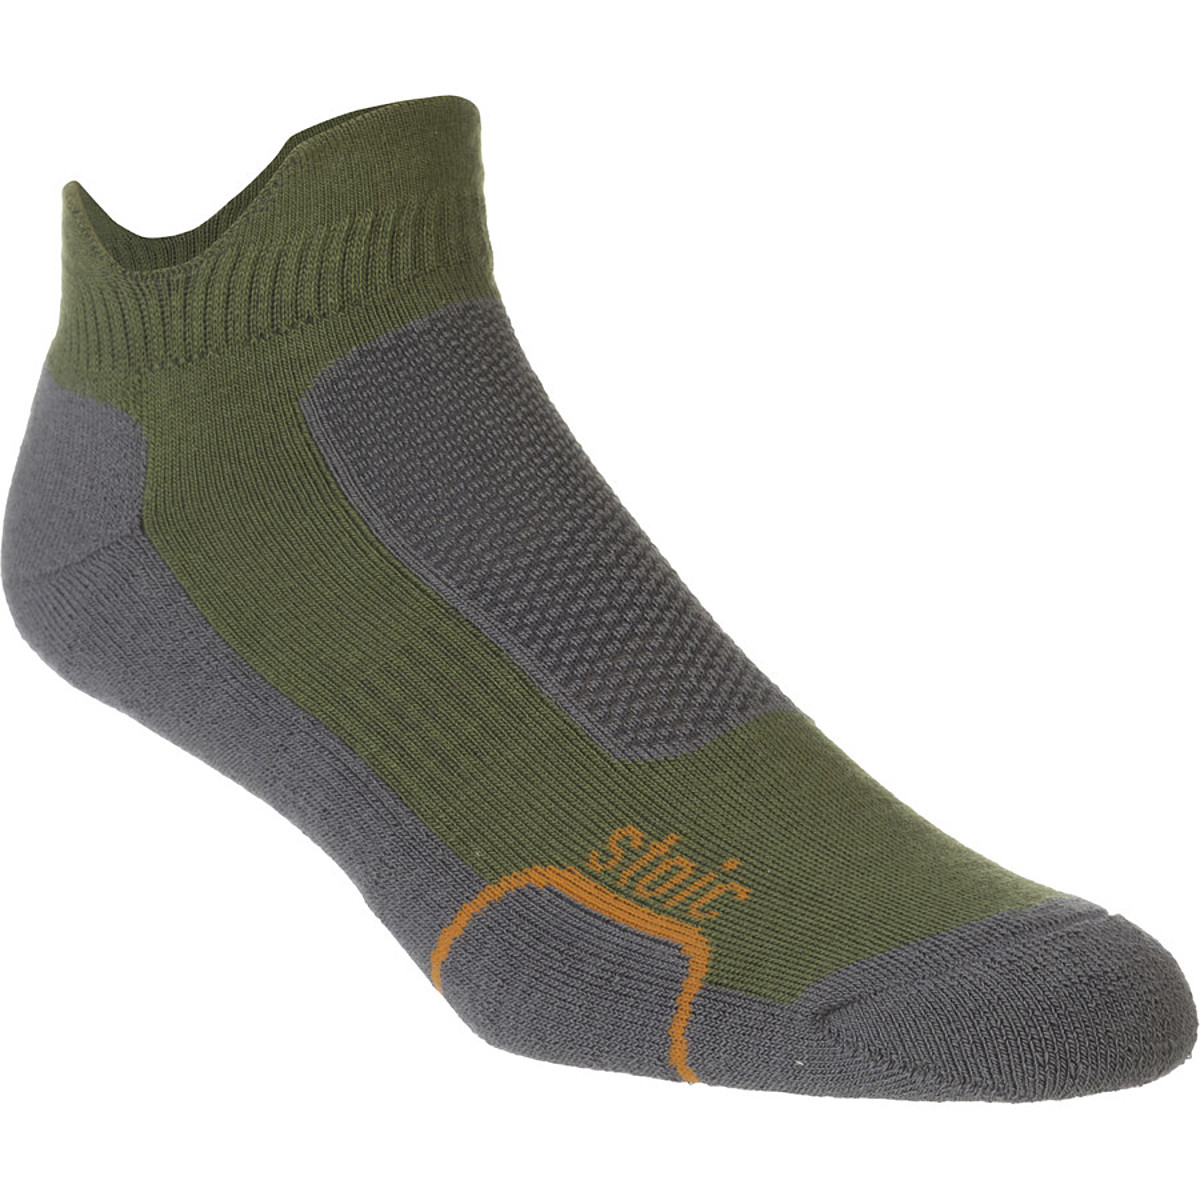 Stoic Merino Comp Trail No-Show Sock - 2pr